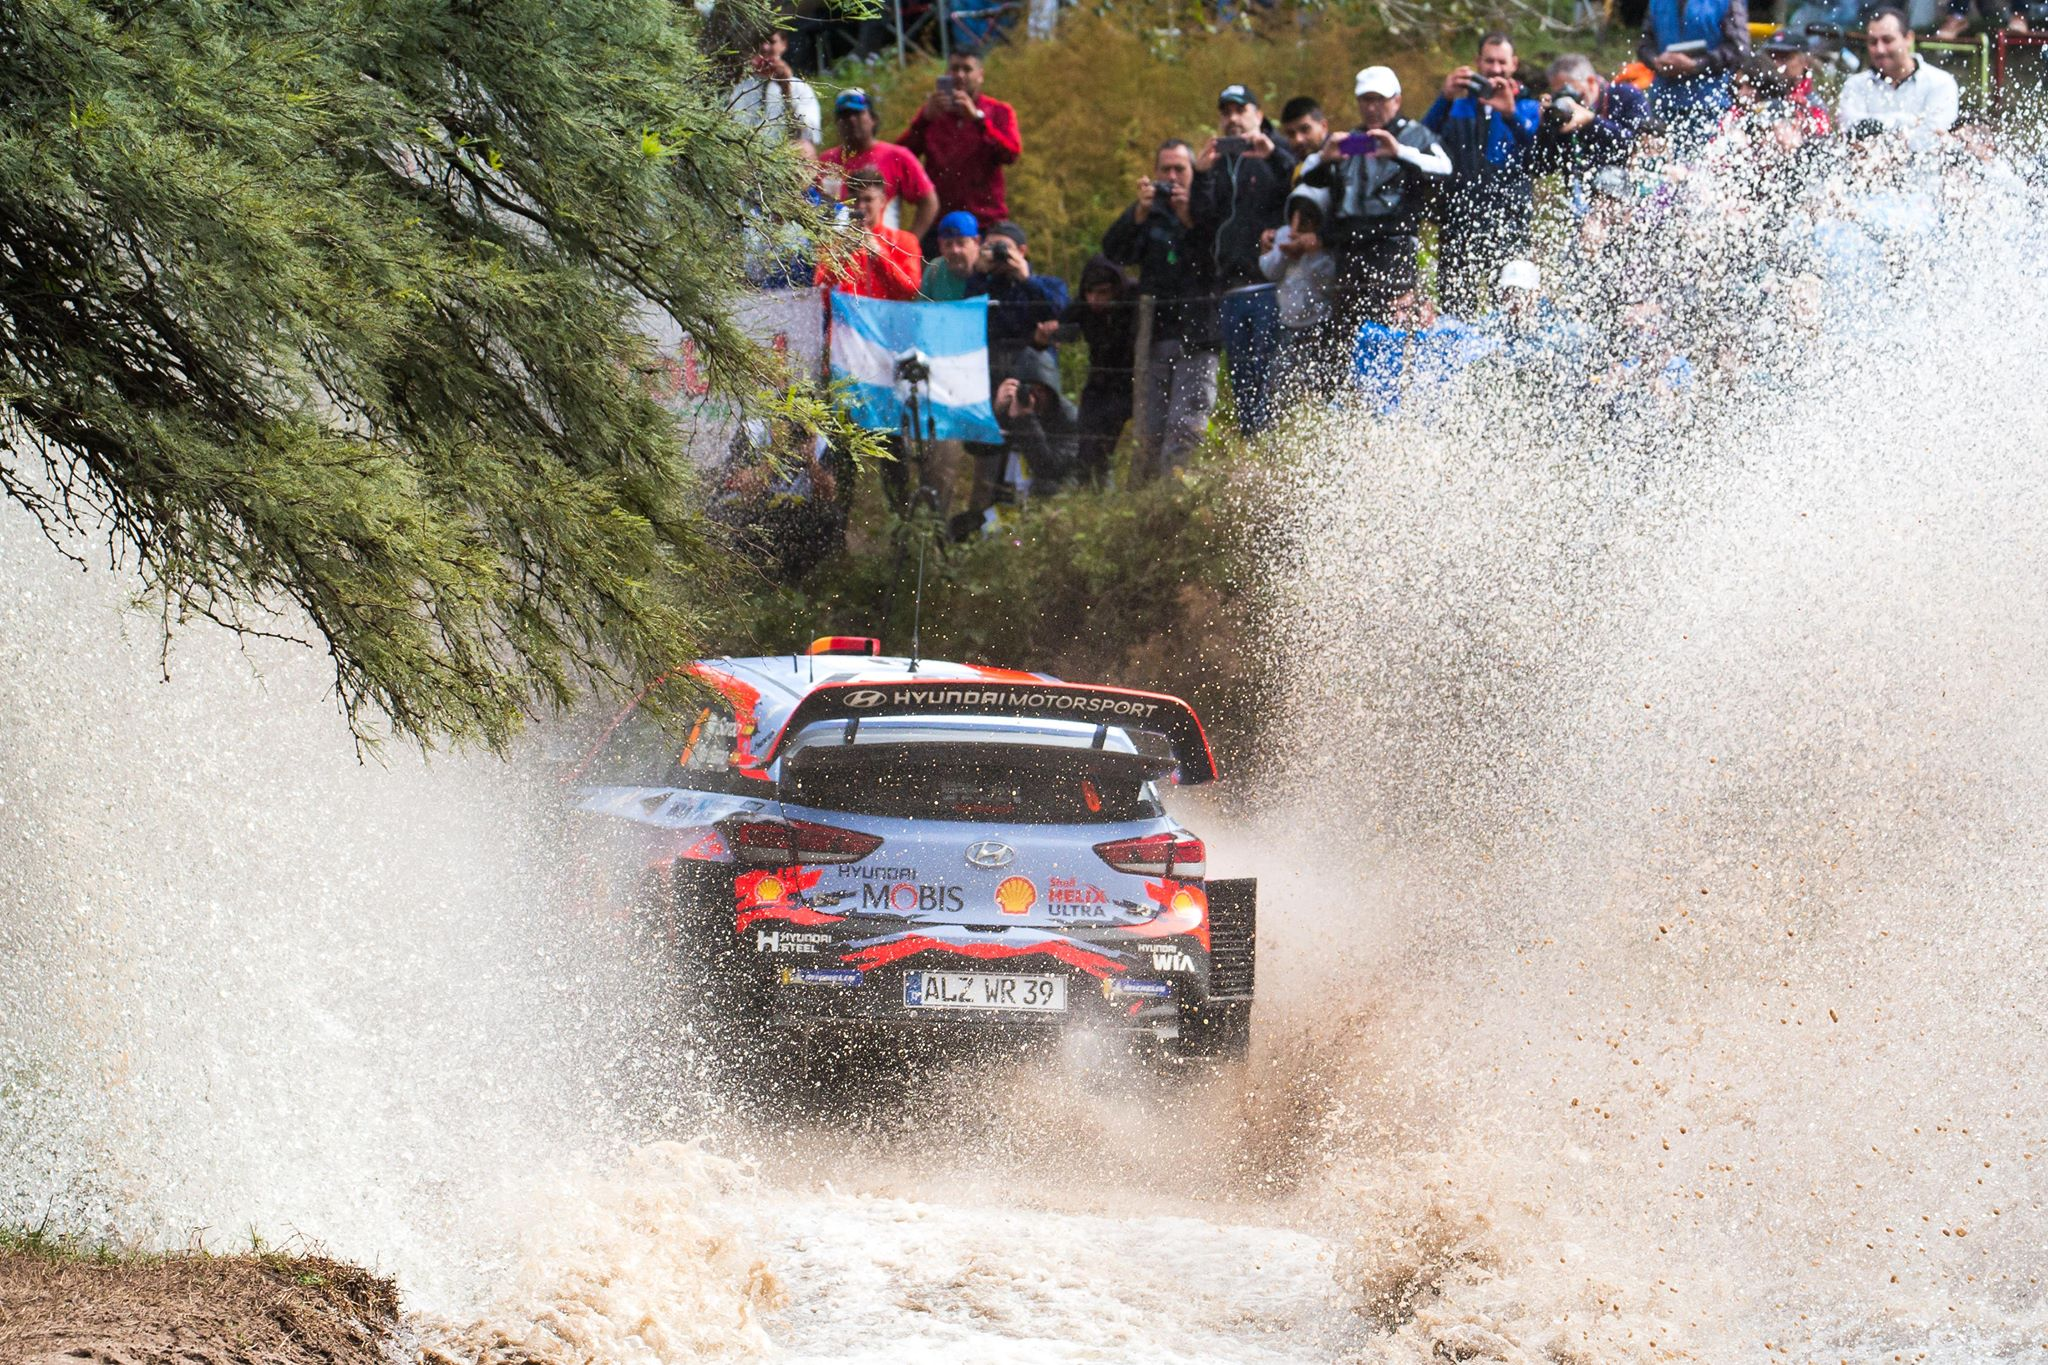 fb/Hyundai Motorsport